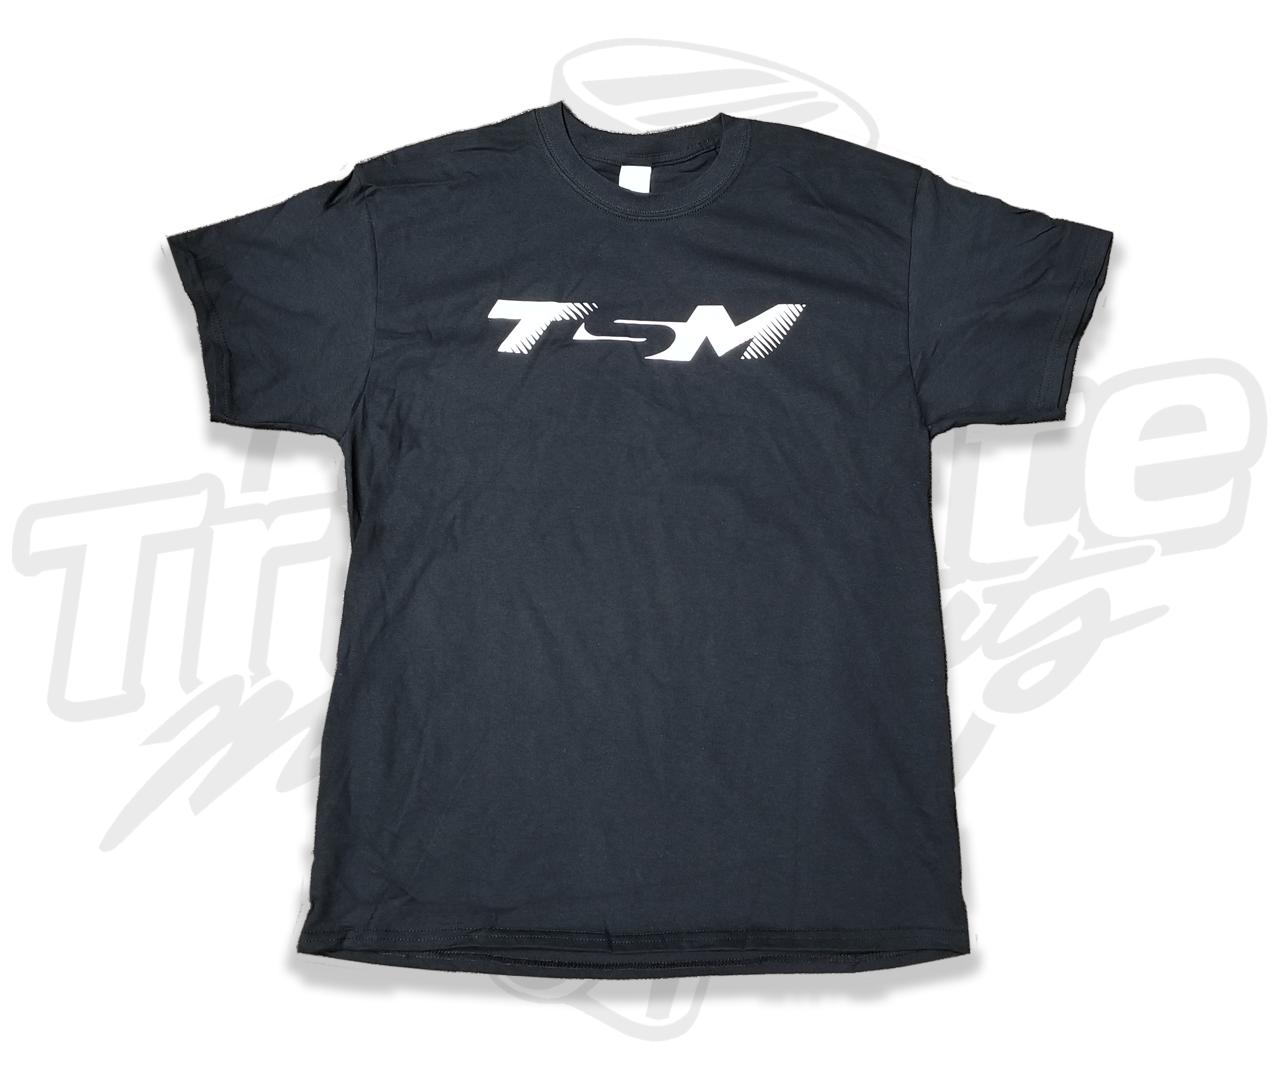 TSM - 2018 T-Shirt